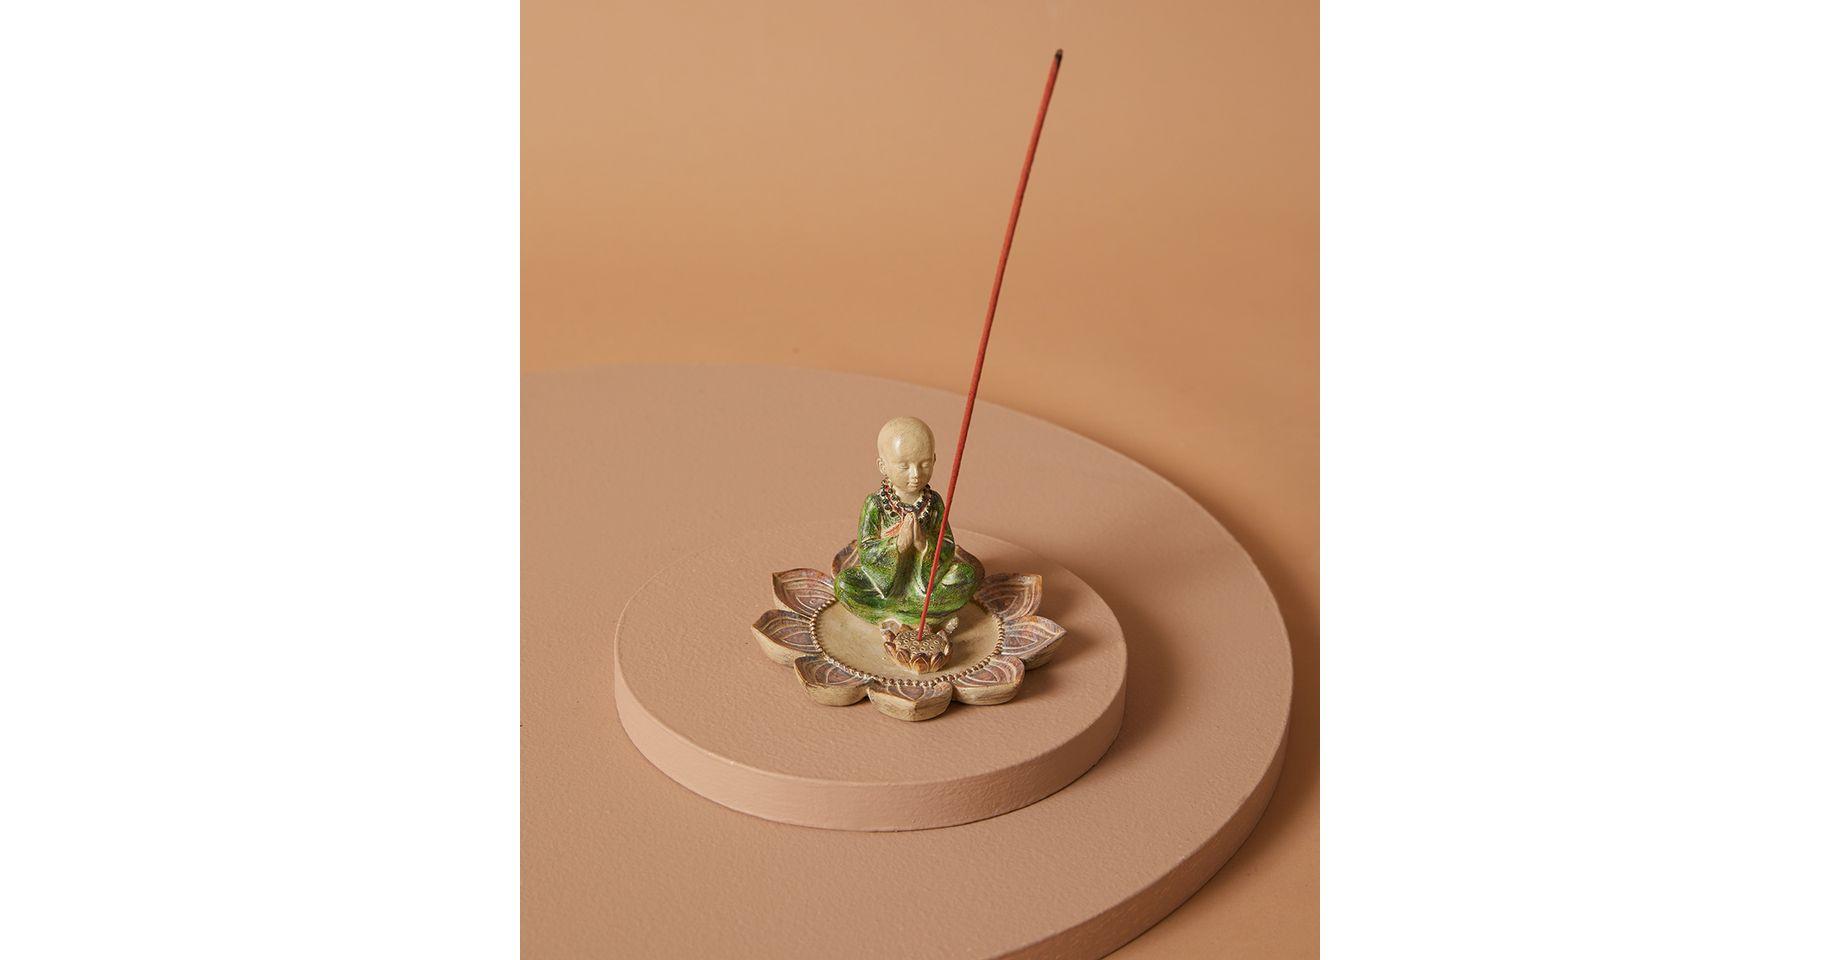 incensario-monge-dakar-colorido